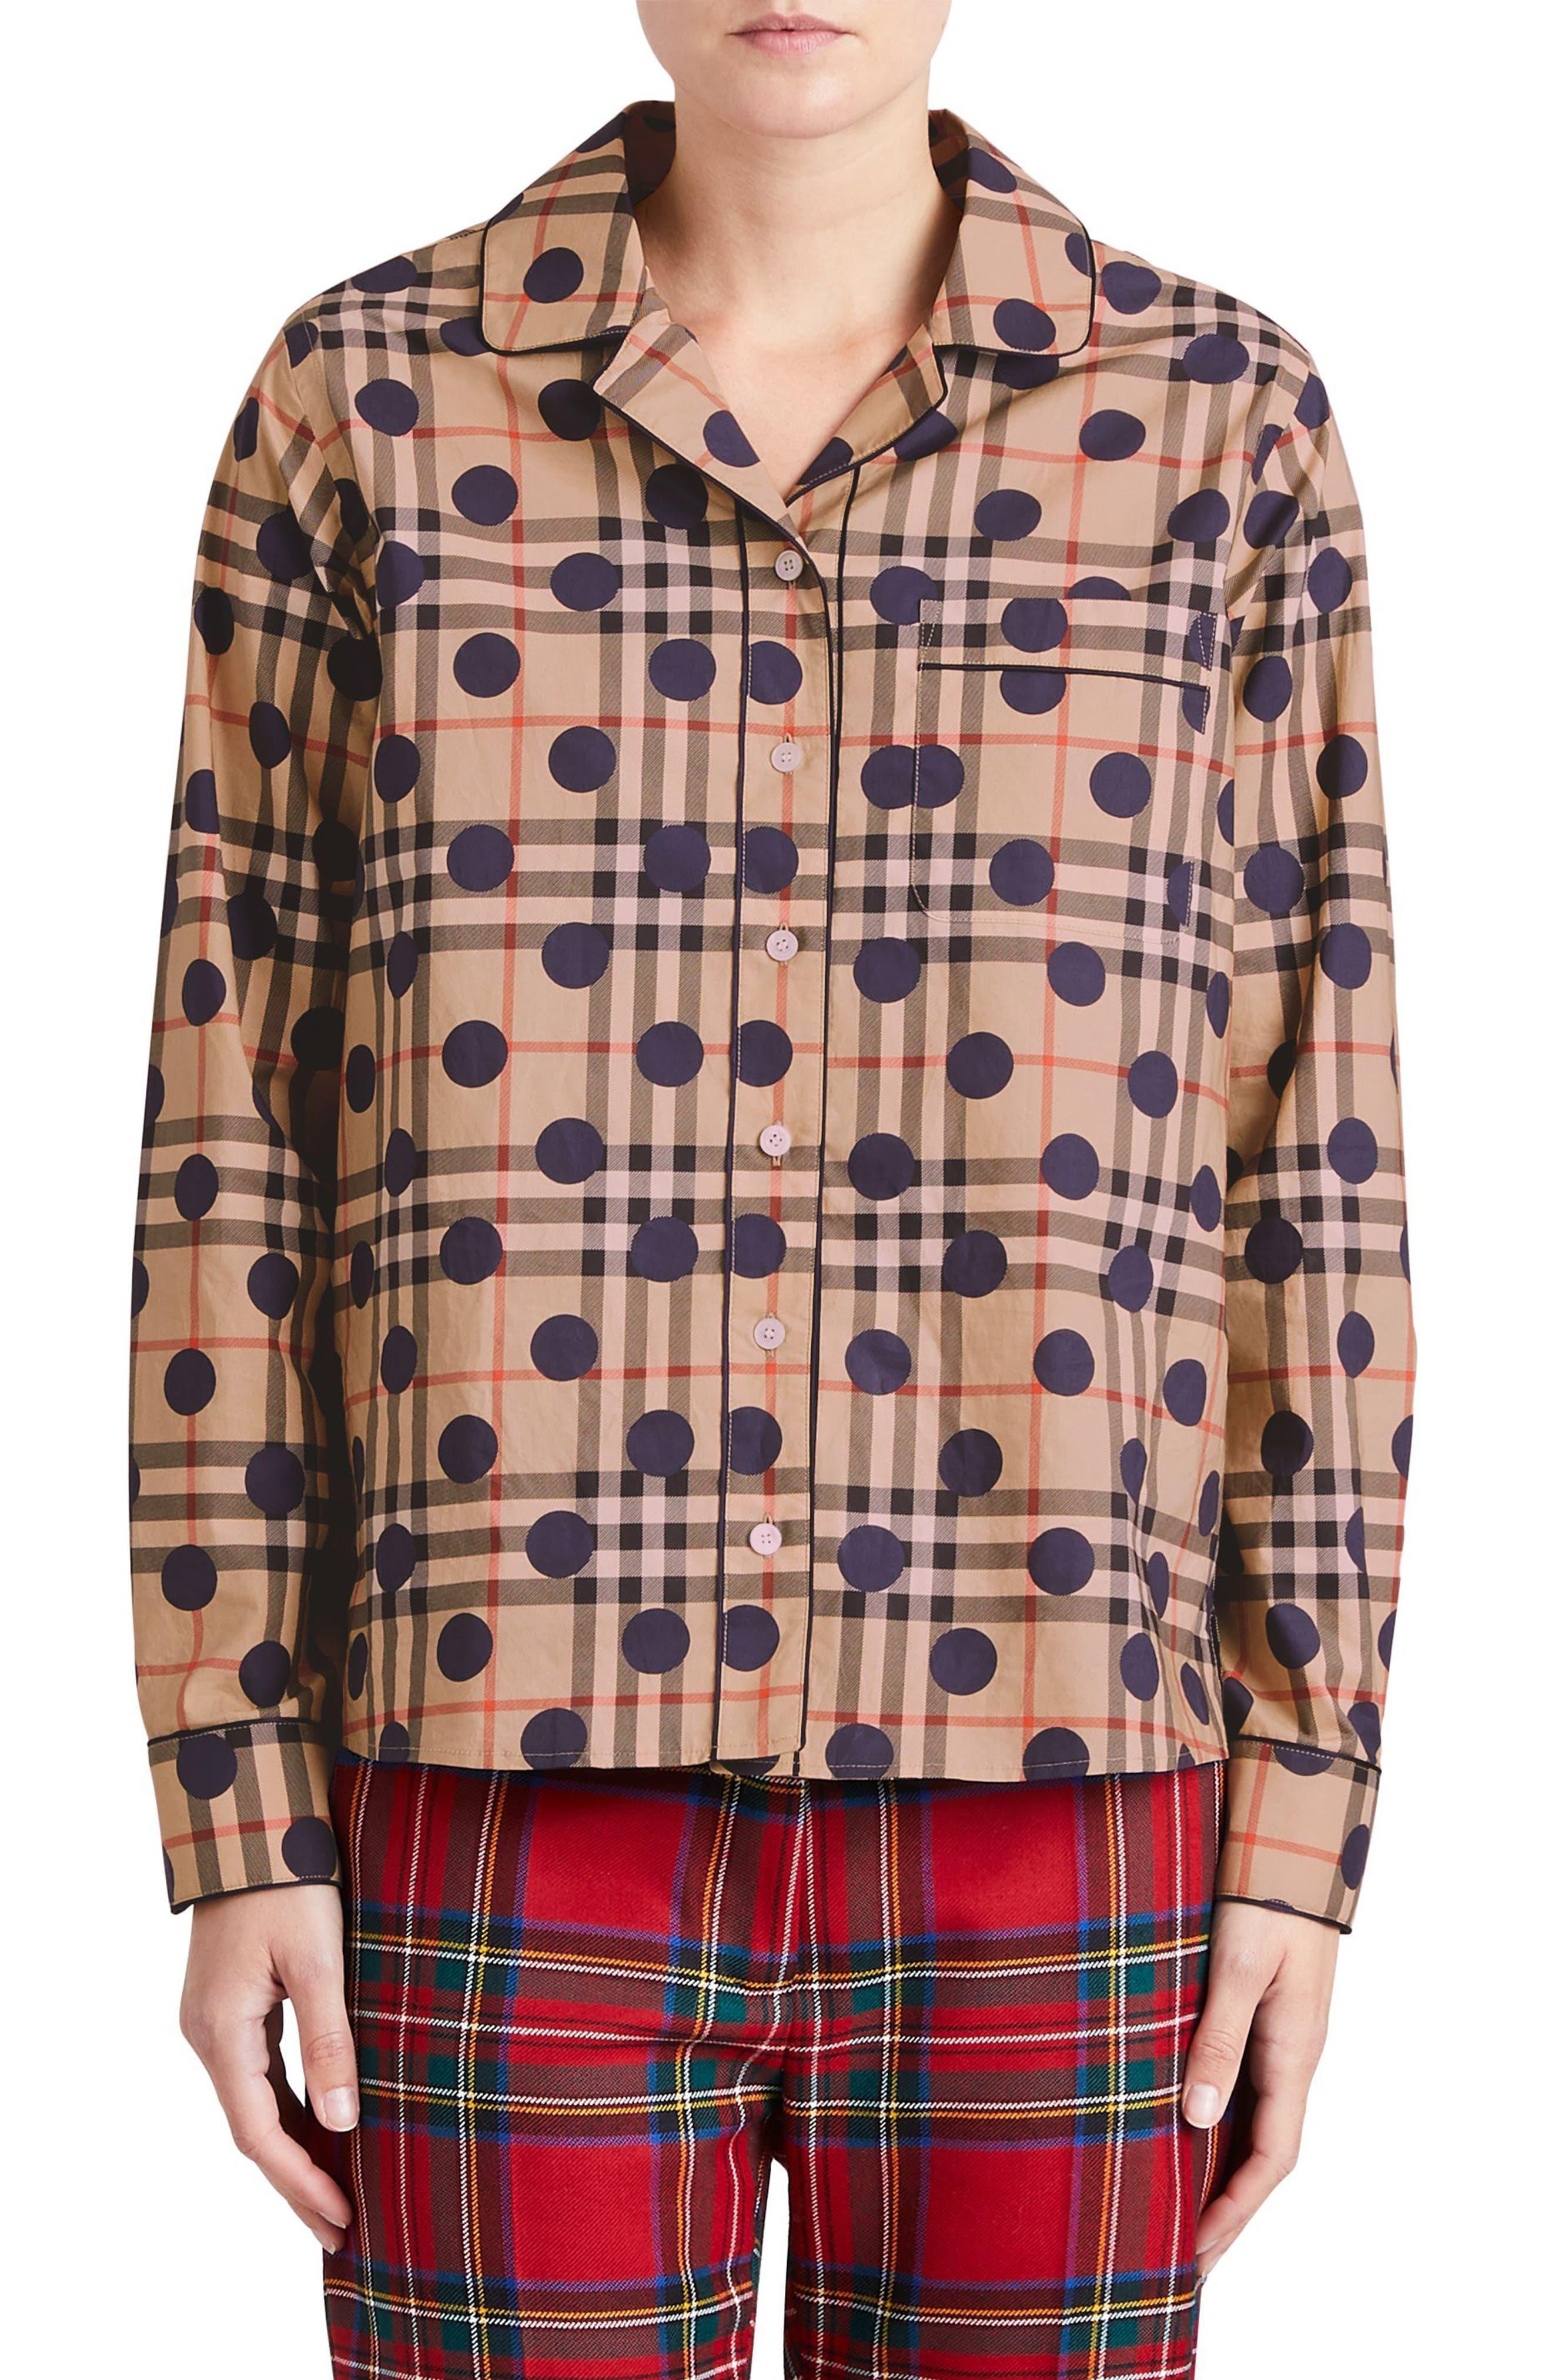 Polka Dot Check Print Cotton Shirt,                         Main,                         color, Camel Multi